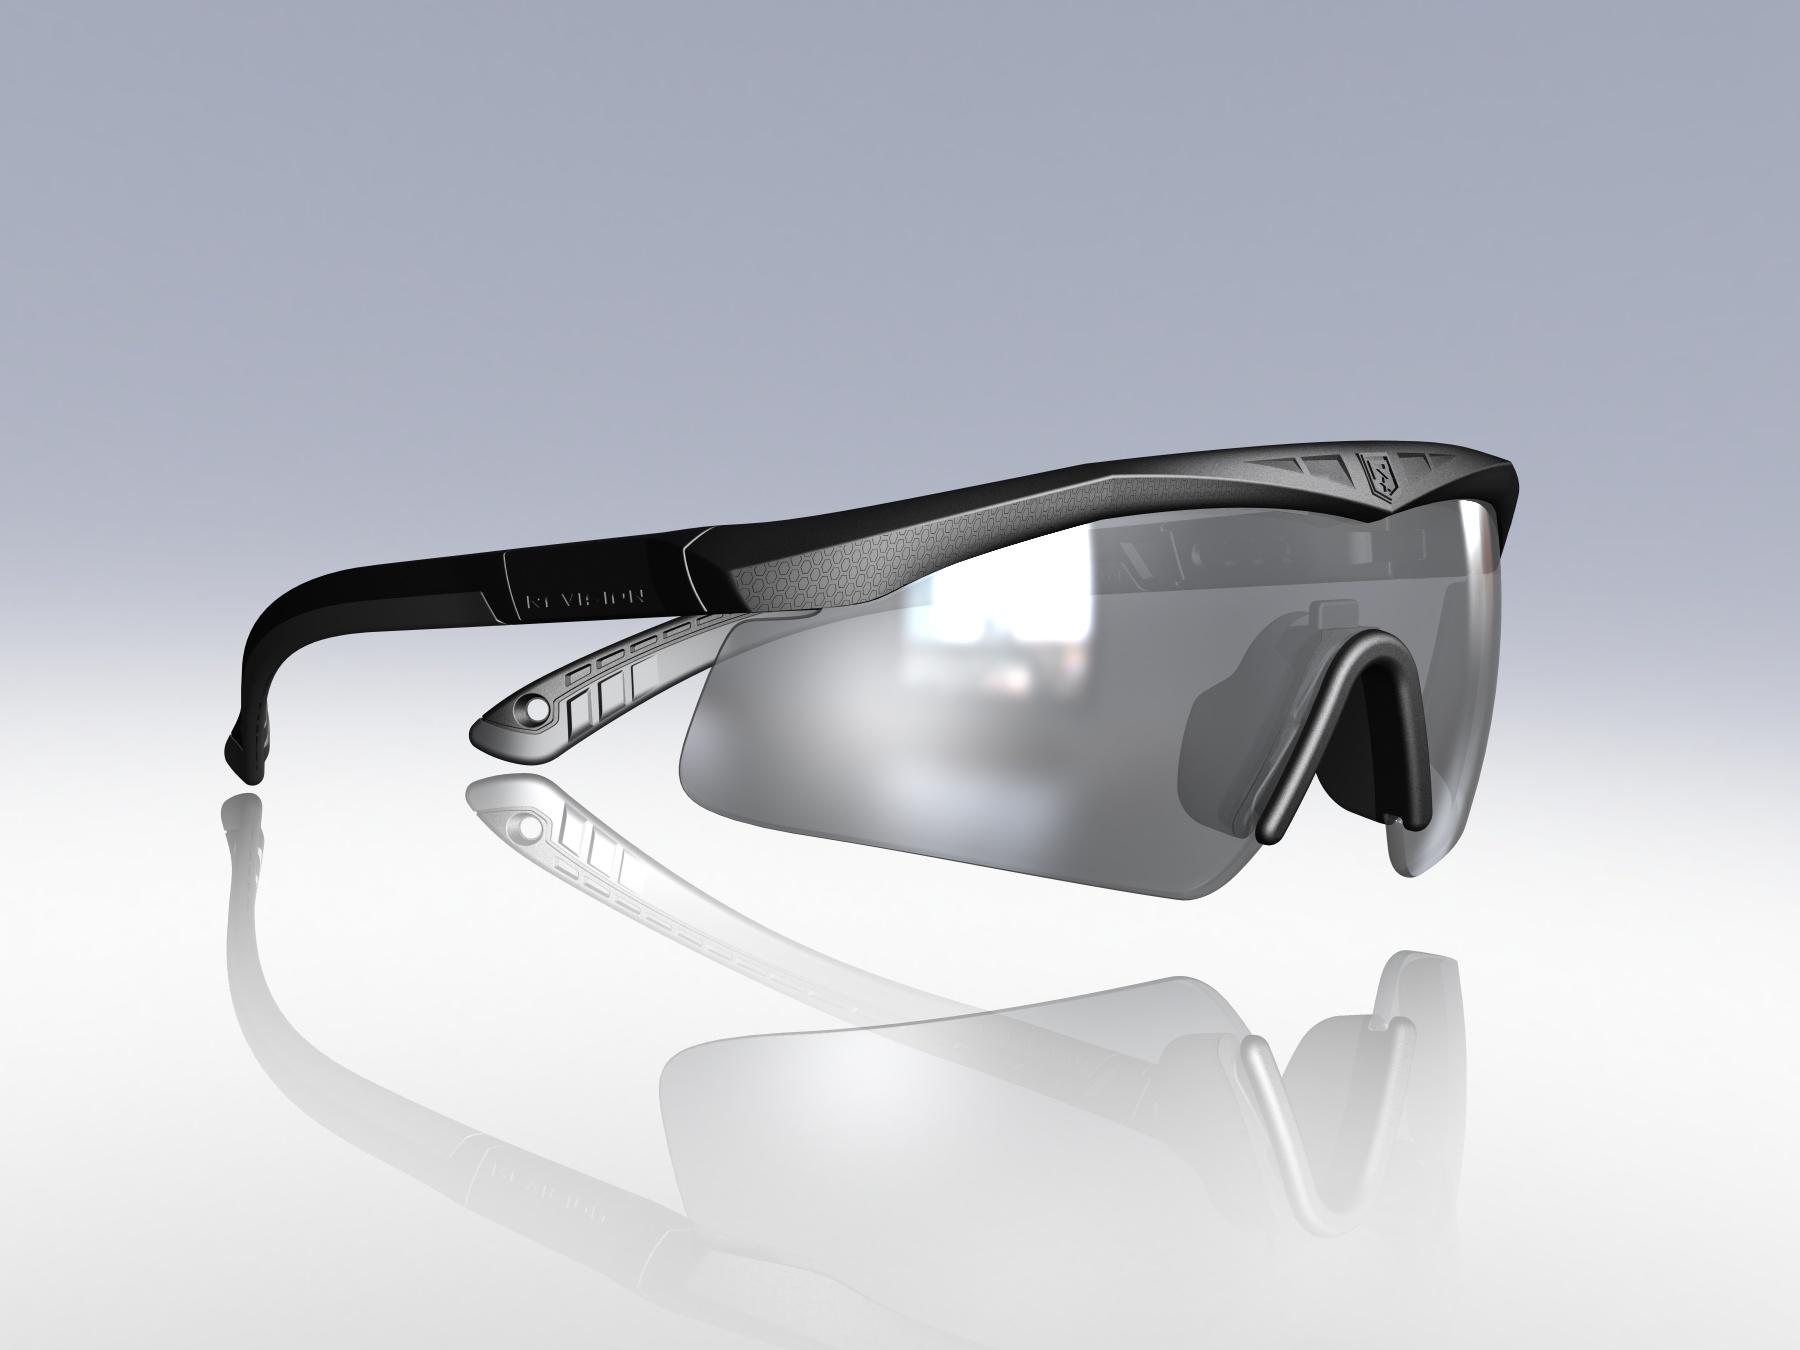 revision eyewear sawfly large size goggles